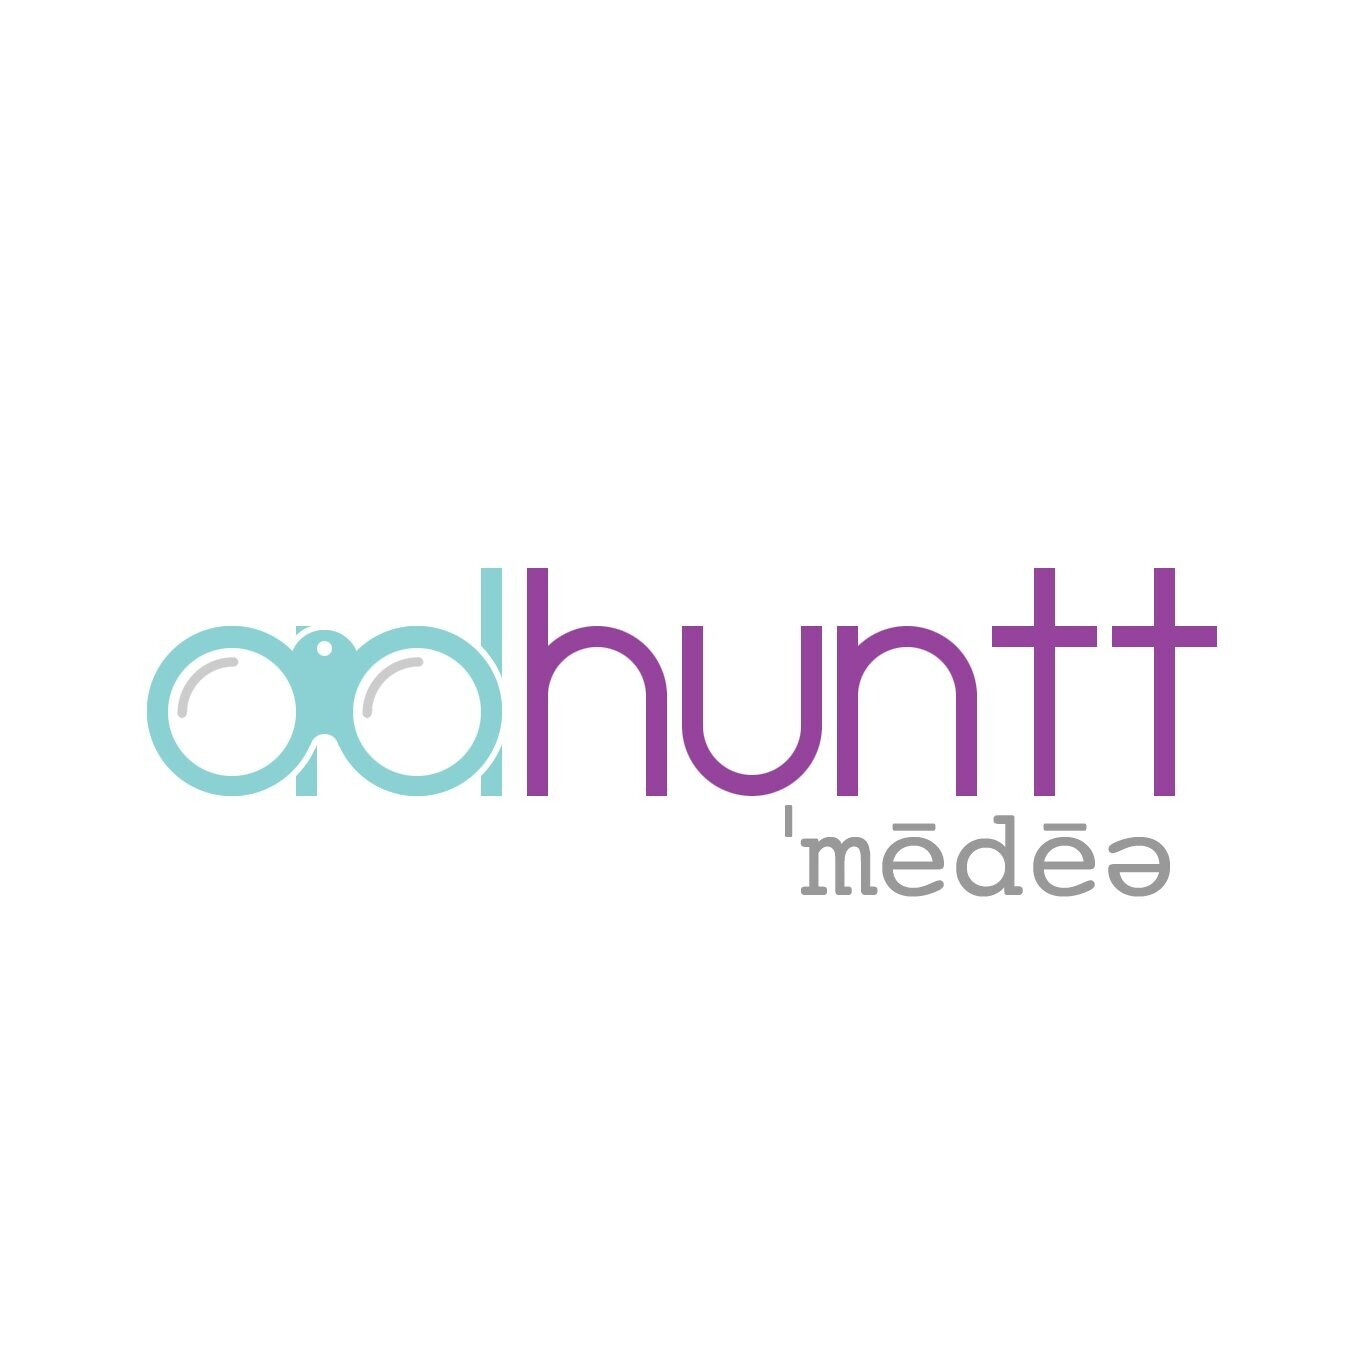 Adhuntt Media